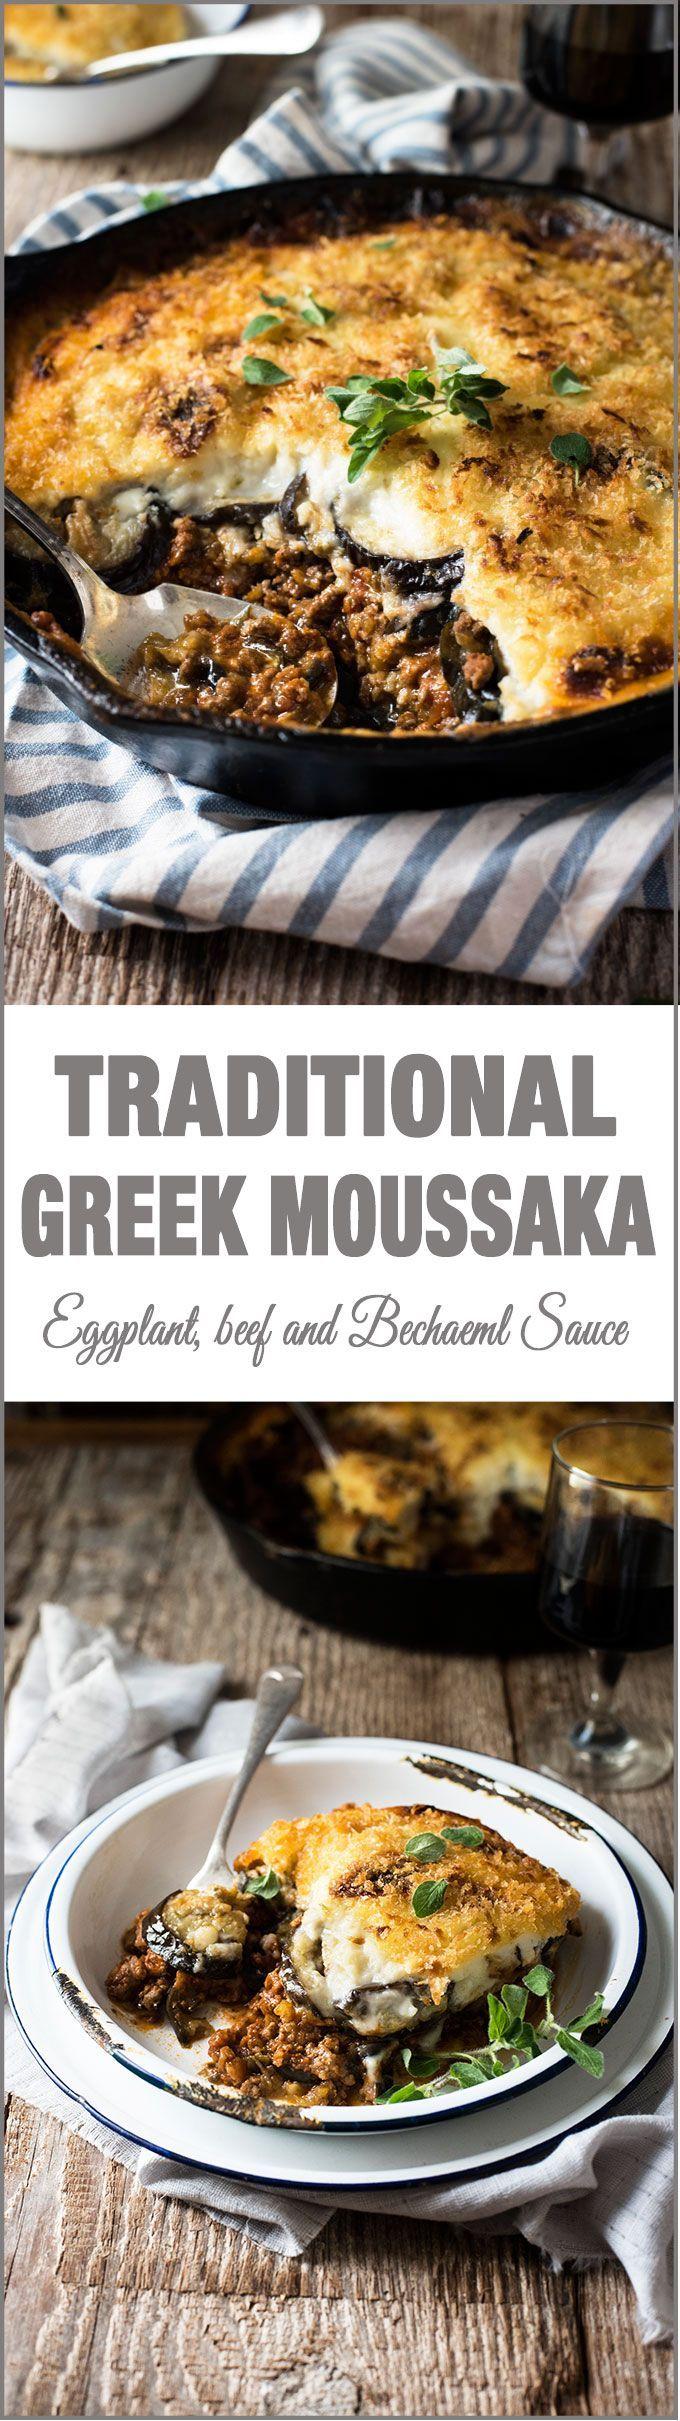 Best 25 ethnic food recipes ideas on pinterest east indian food greek moussaka eggplant beef bake beef recipesgreek food forumfinder Image collections